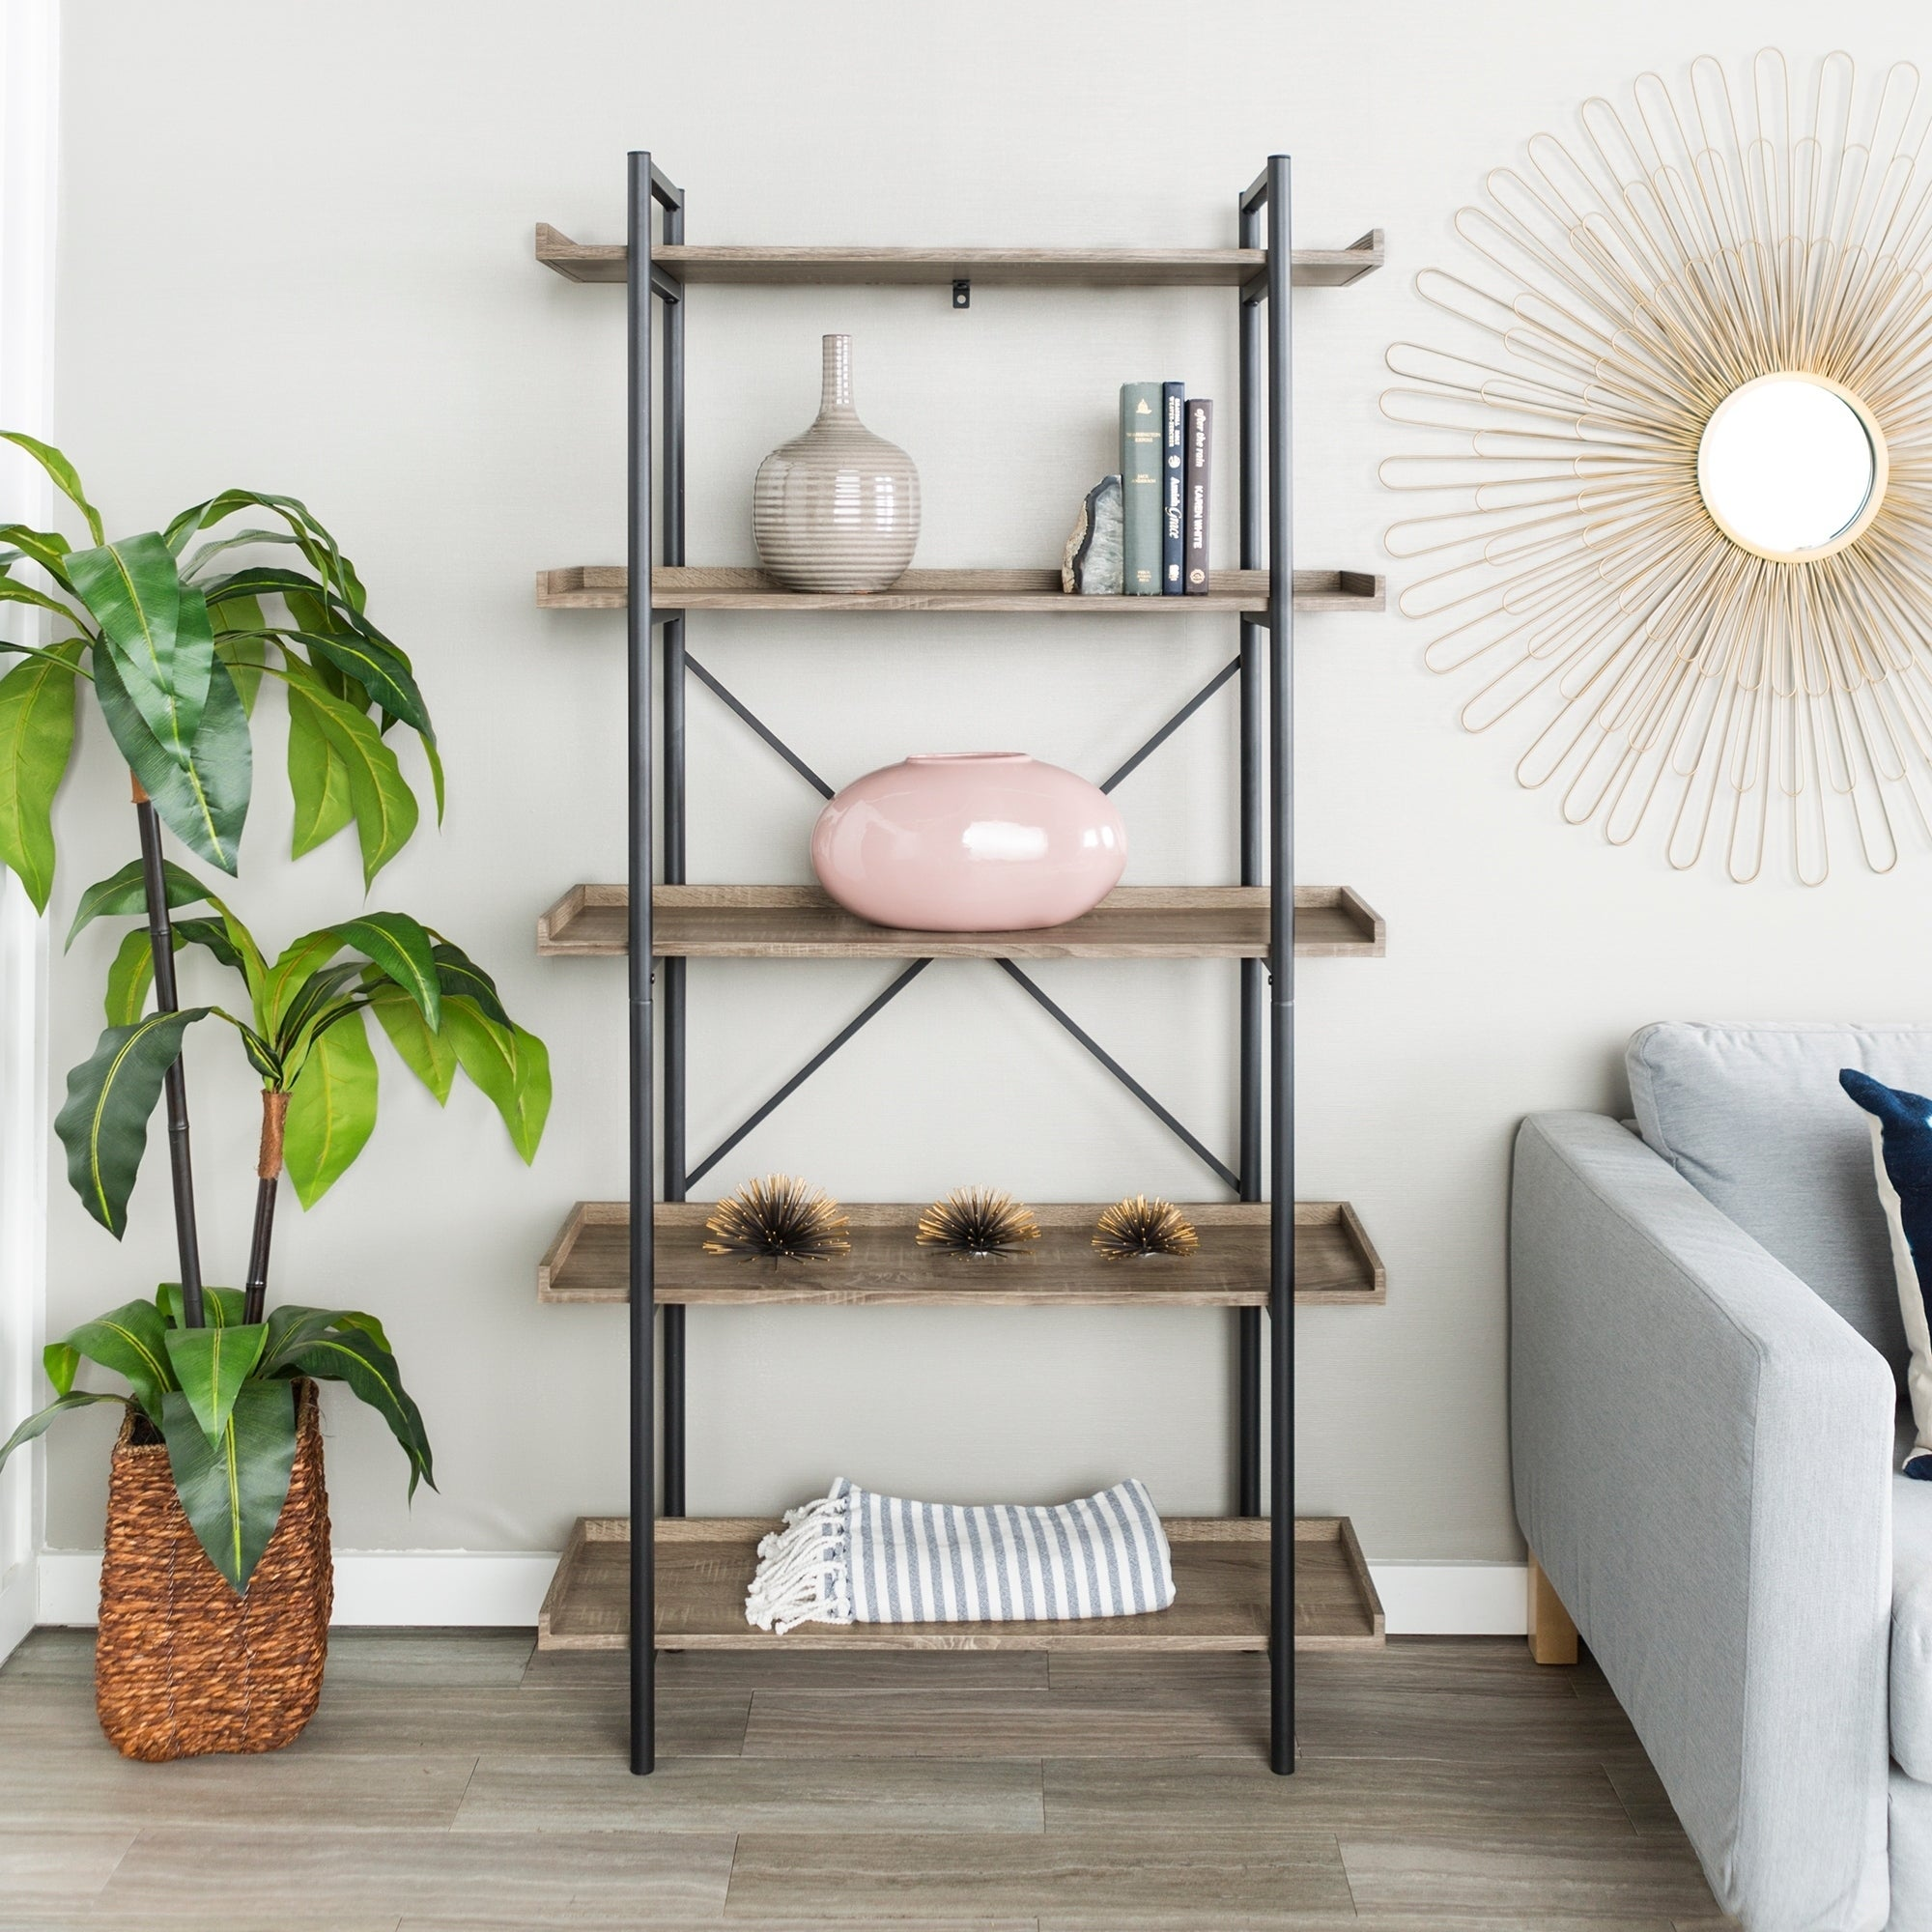 Buy Bookshelves U0026 Bookcases Online At Overstock.com | Our Best Living Room  Furniture Deals